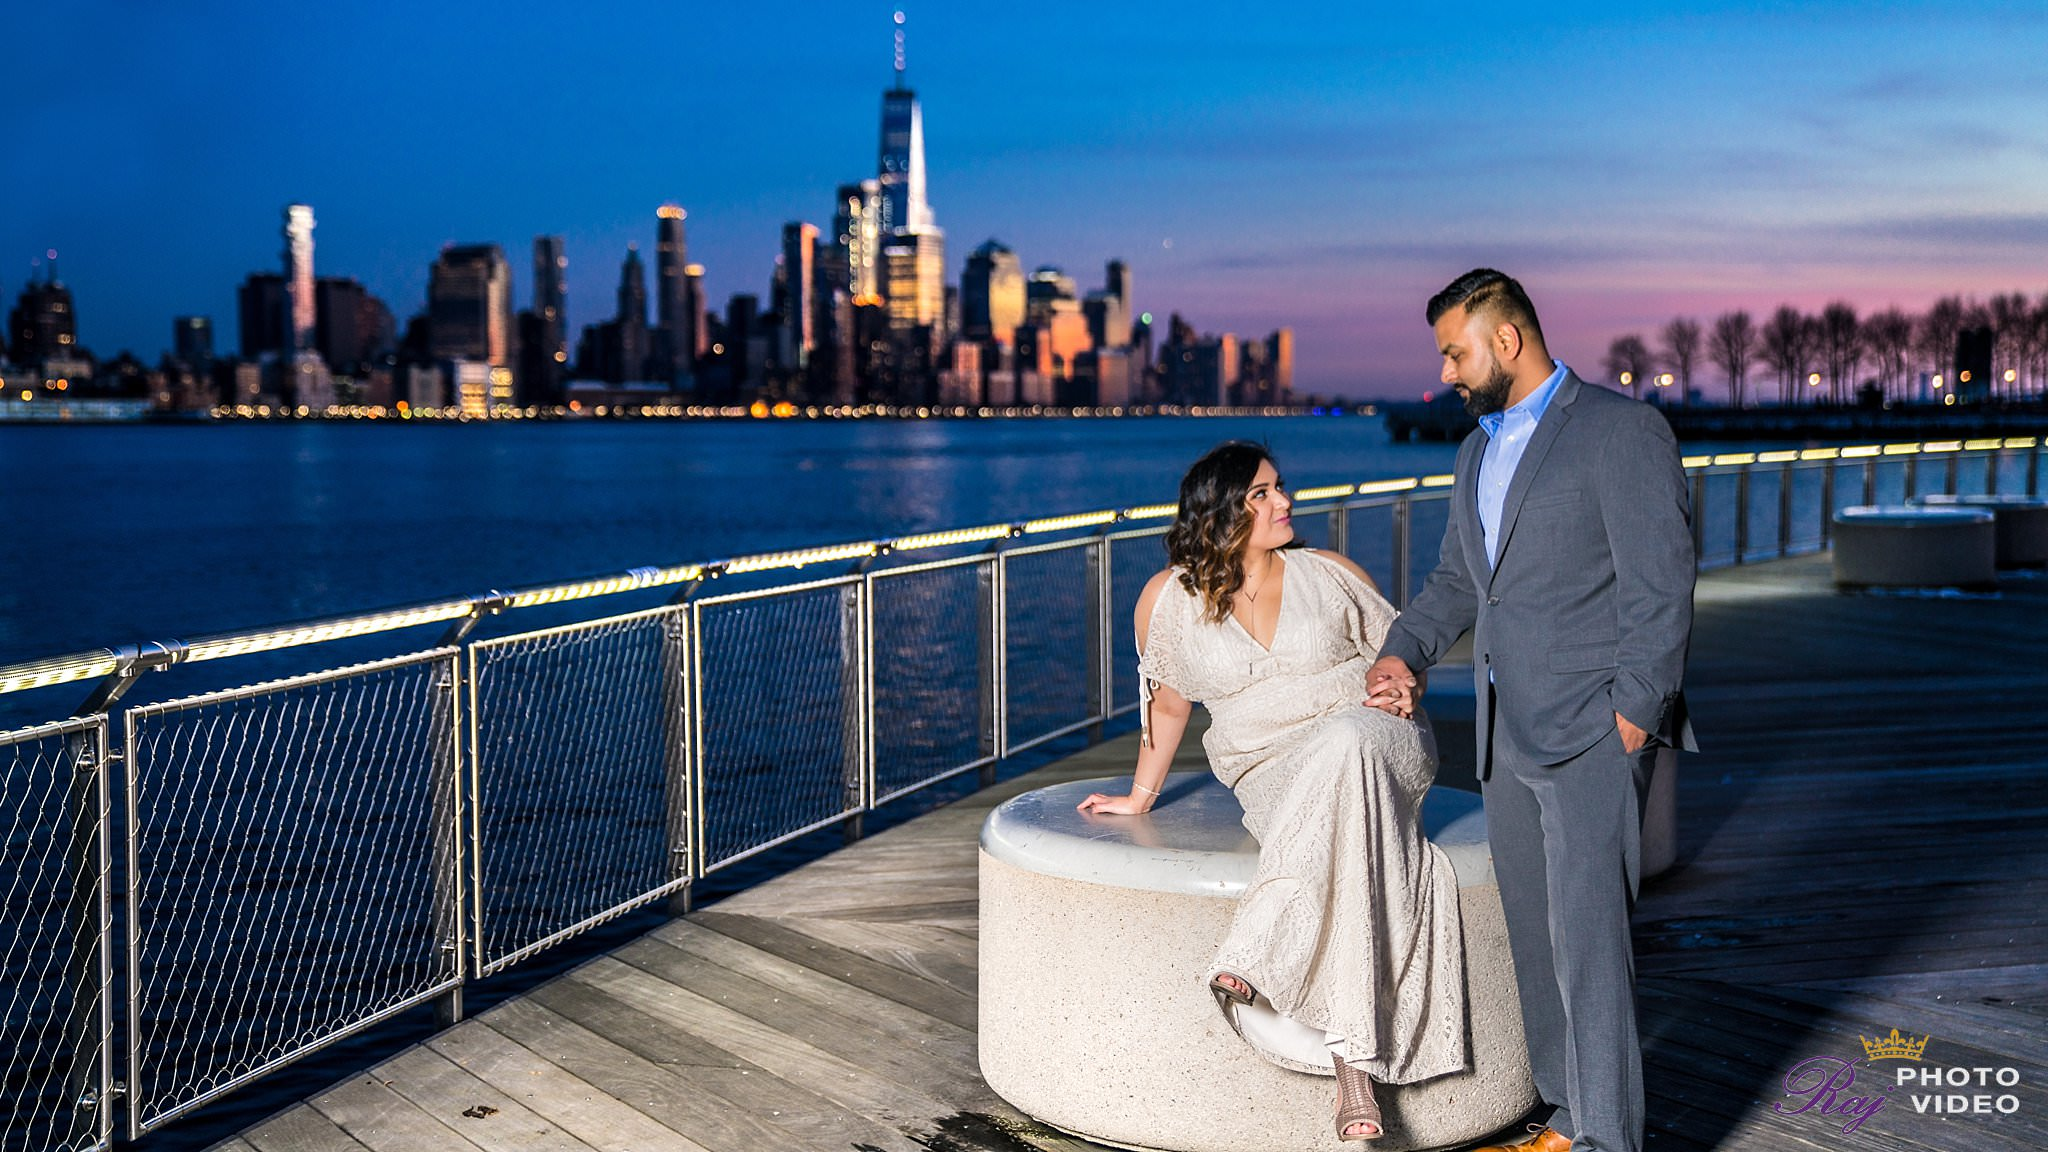 Hoboken-Pier-Engagement-Shoot-Zalak-Parag-00016_Raj_Photo_Video.jpg